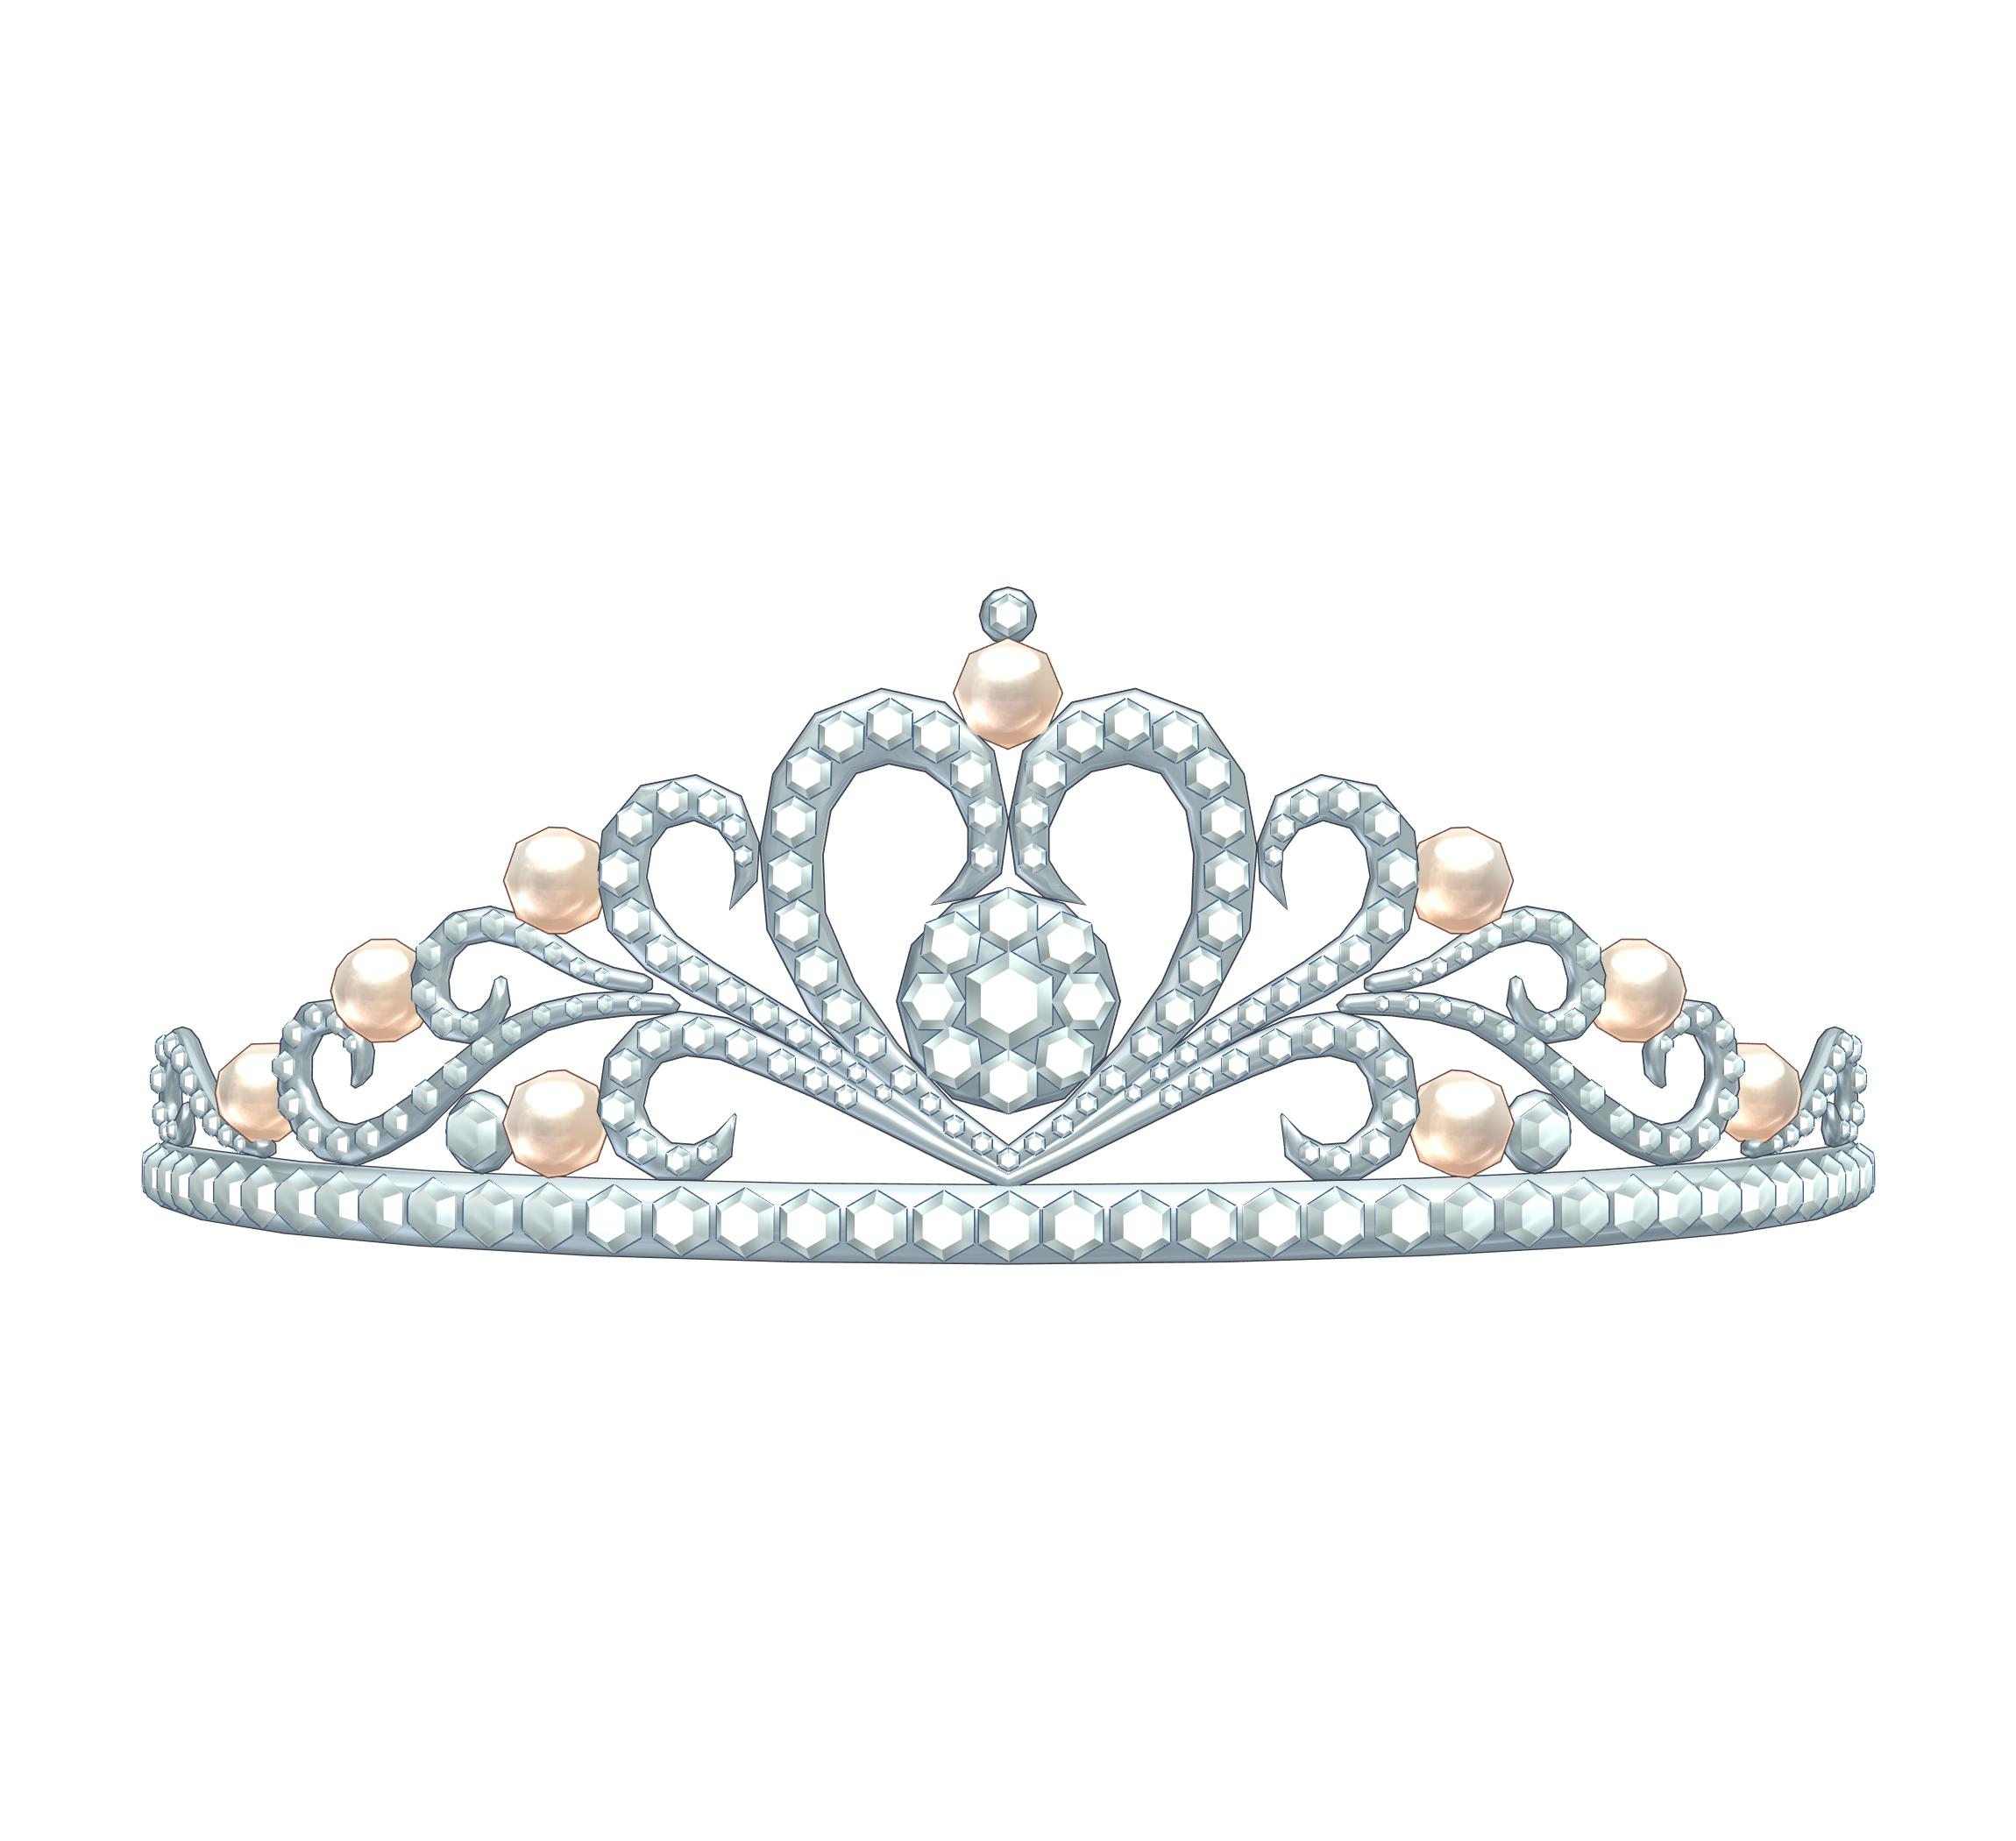 mmd___pretty_tiara_download_by_harulikescarrots-d7qtldl.png (2300×2100) - PNG Tiara